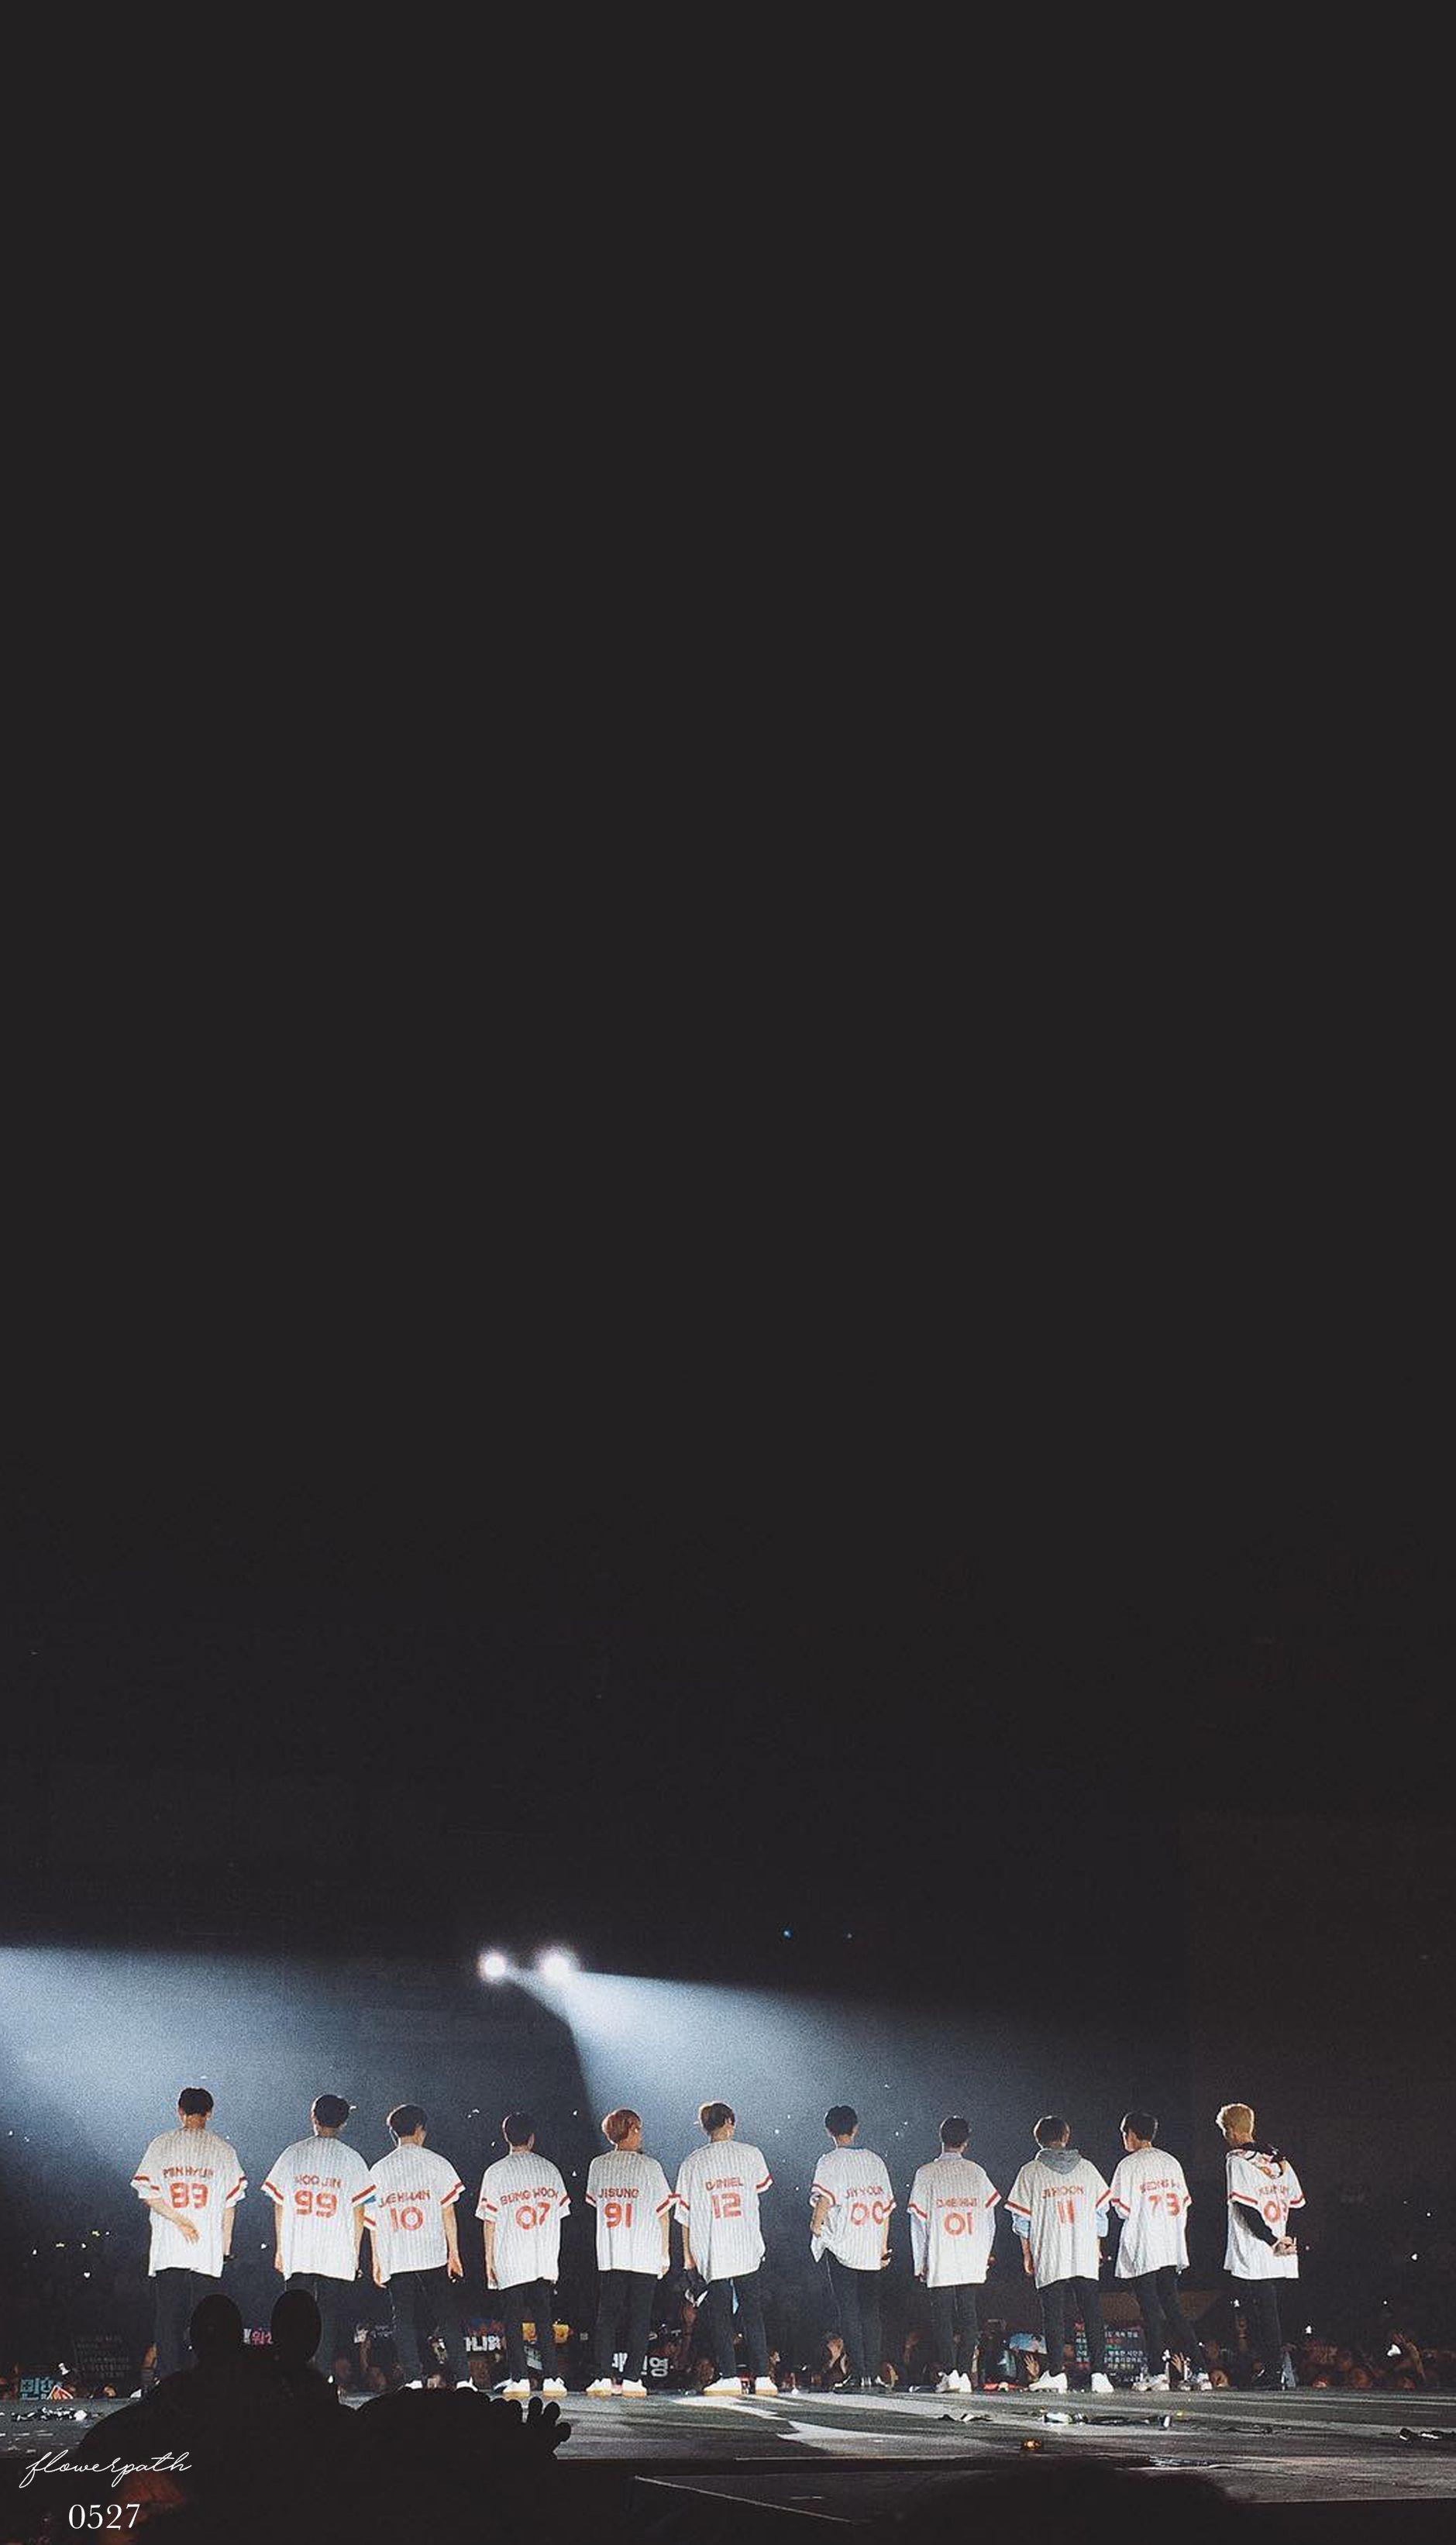 Download 880 Wallpaper Tumblr Wanna One HD Terbaik